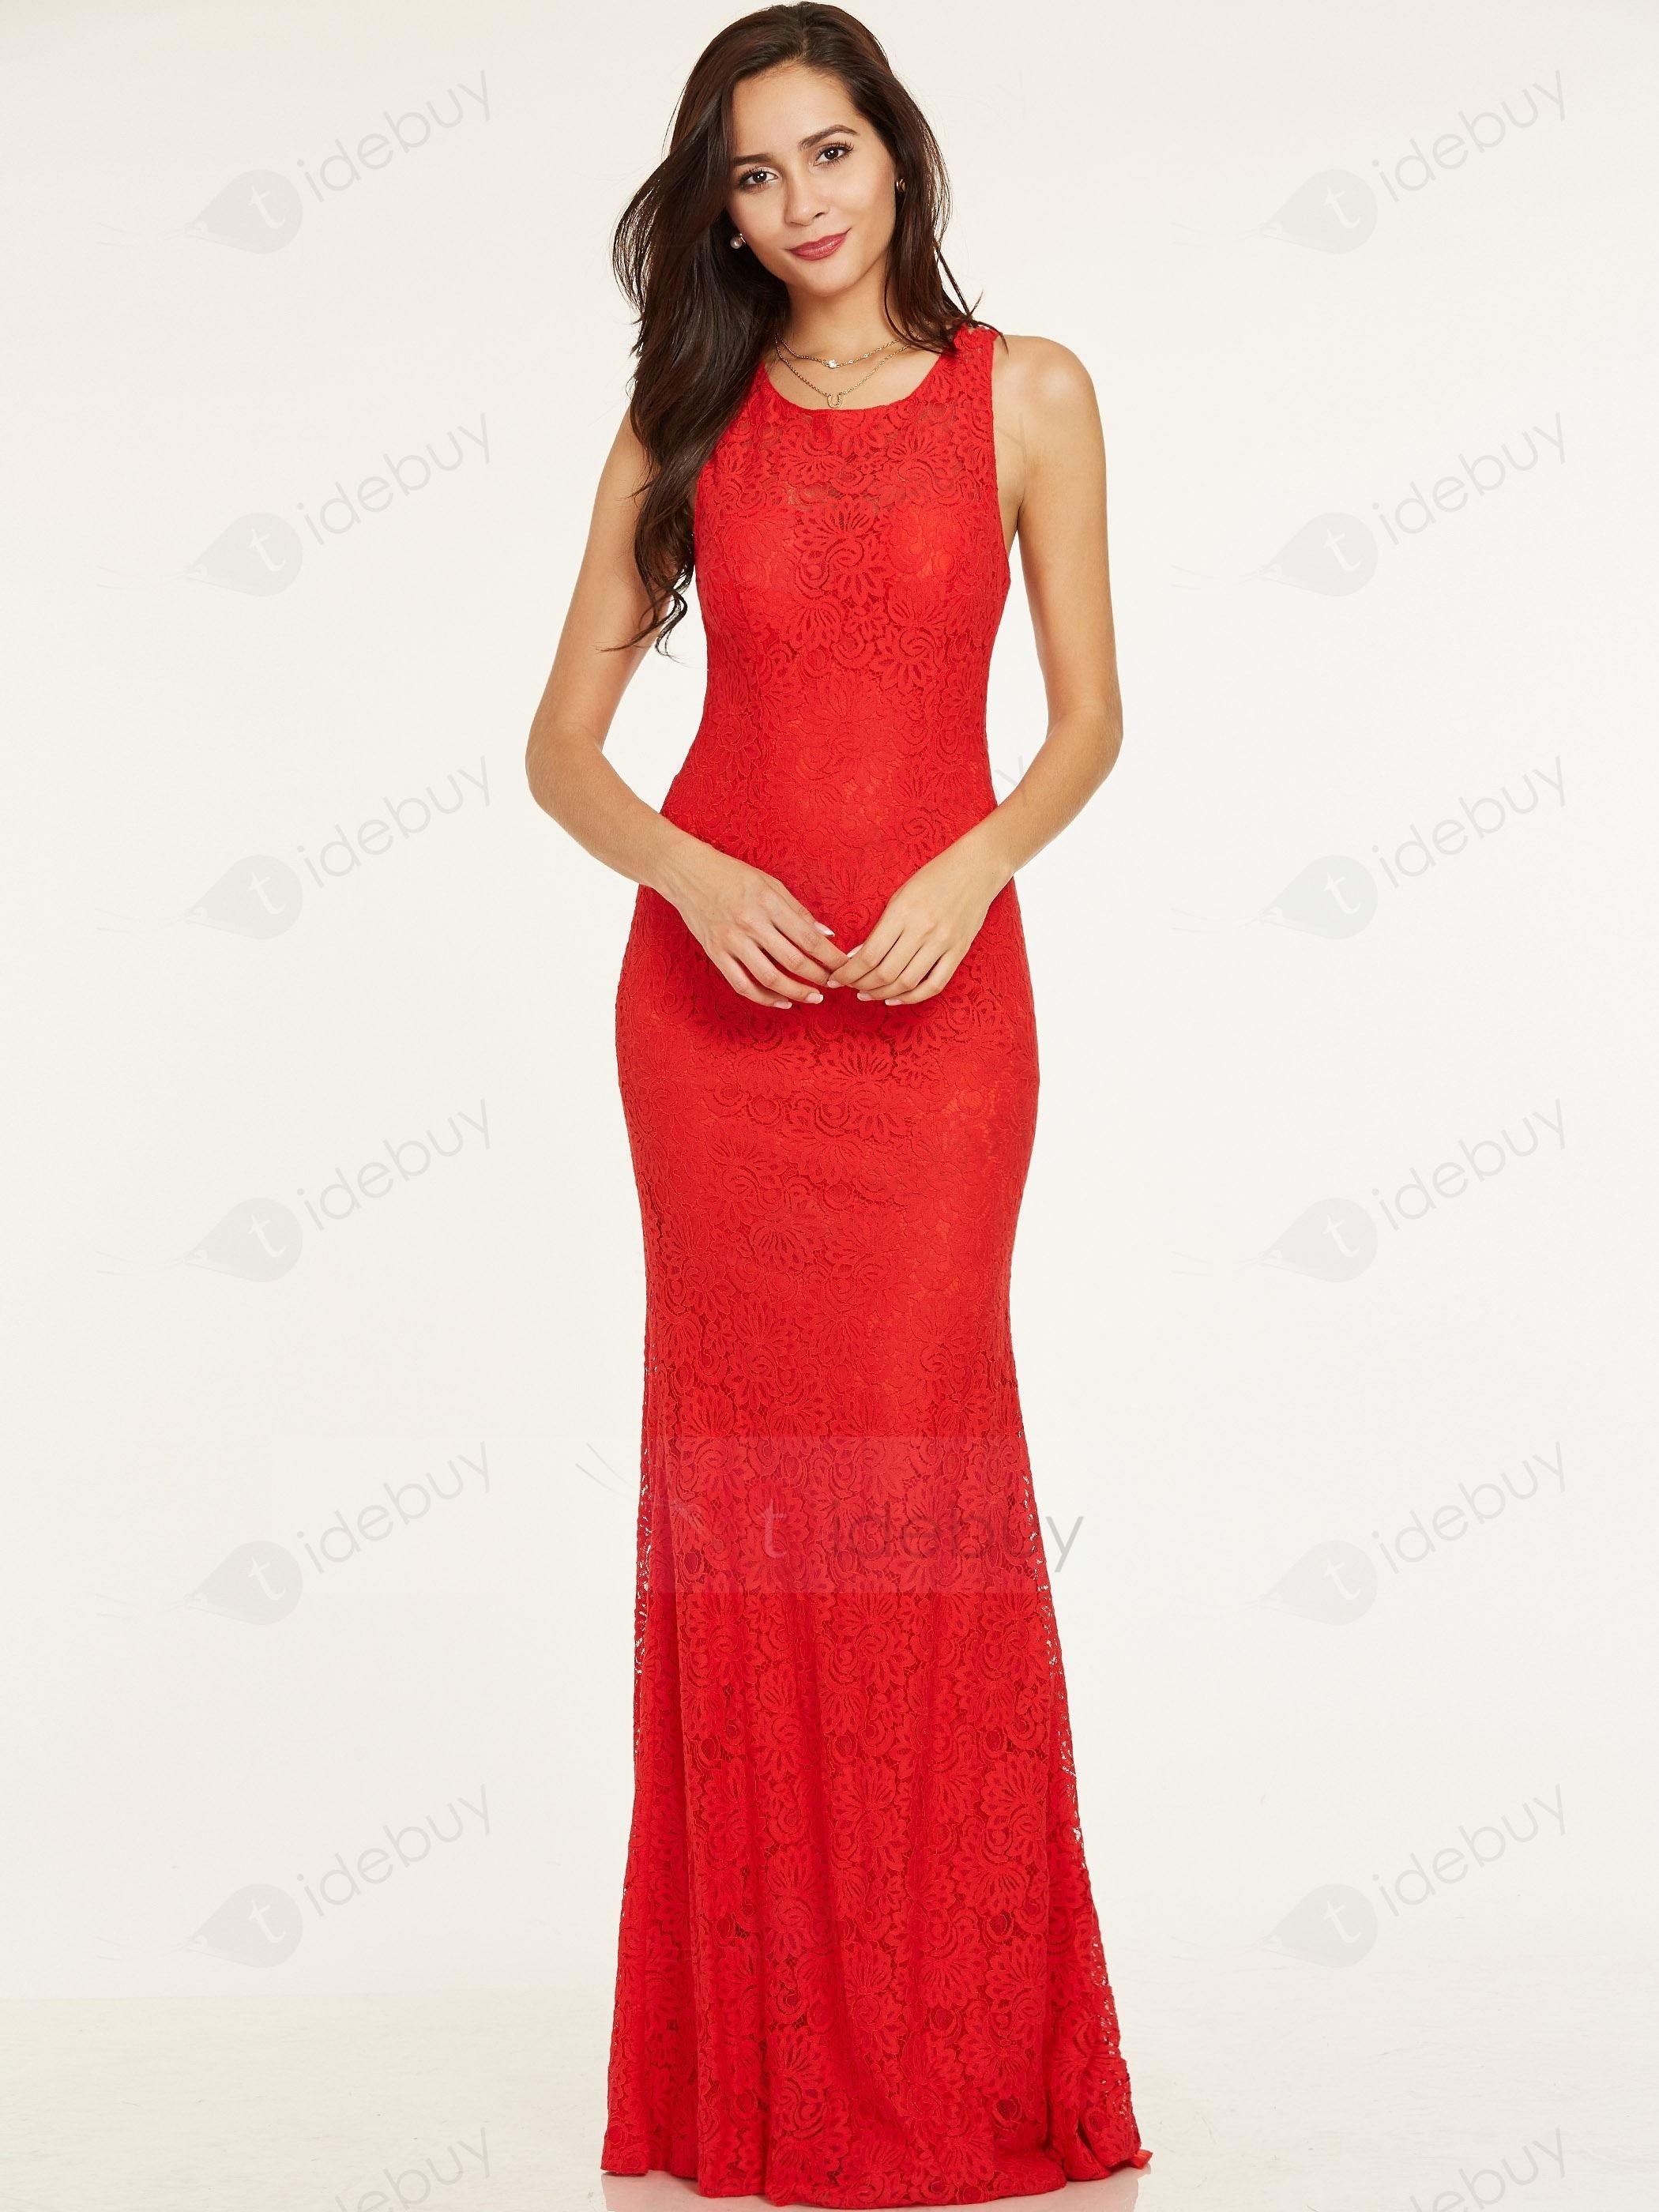 10 Schön Abendkleider Lang Rot Spitze Bester PreisFormal Leicht Abendkleider Lang Rot Spitze Vertrieb